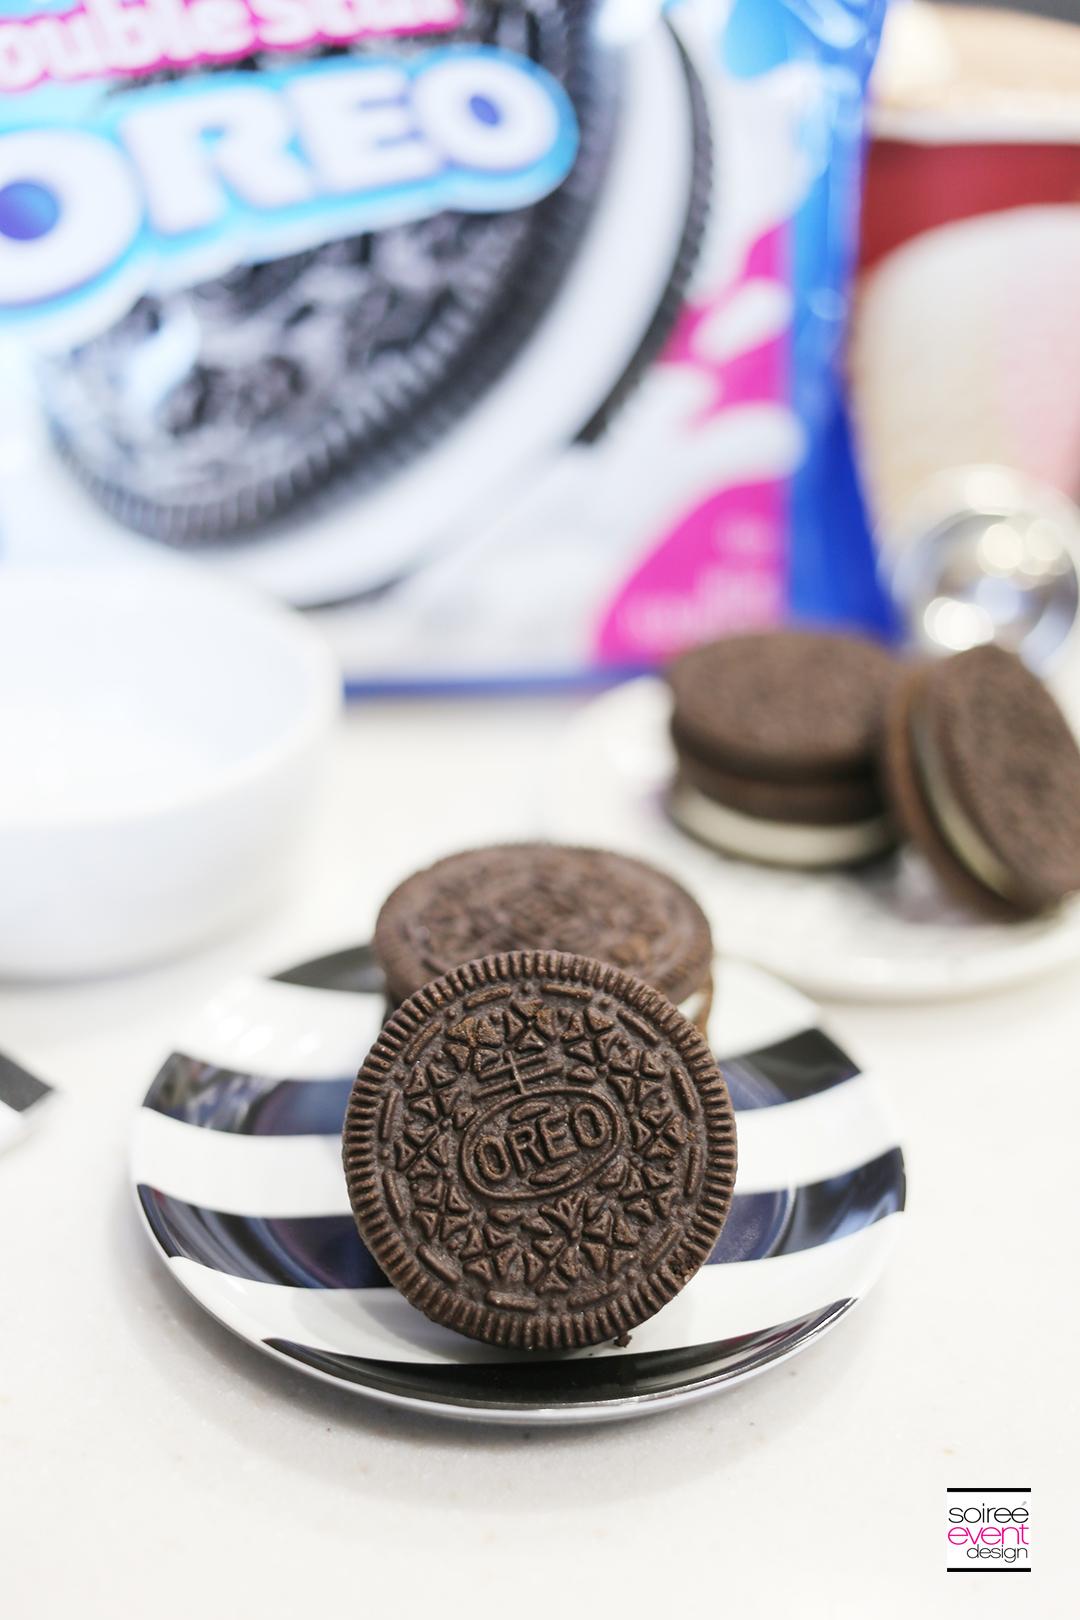 OREO Dunk Challenge - Oreo cookies